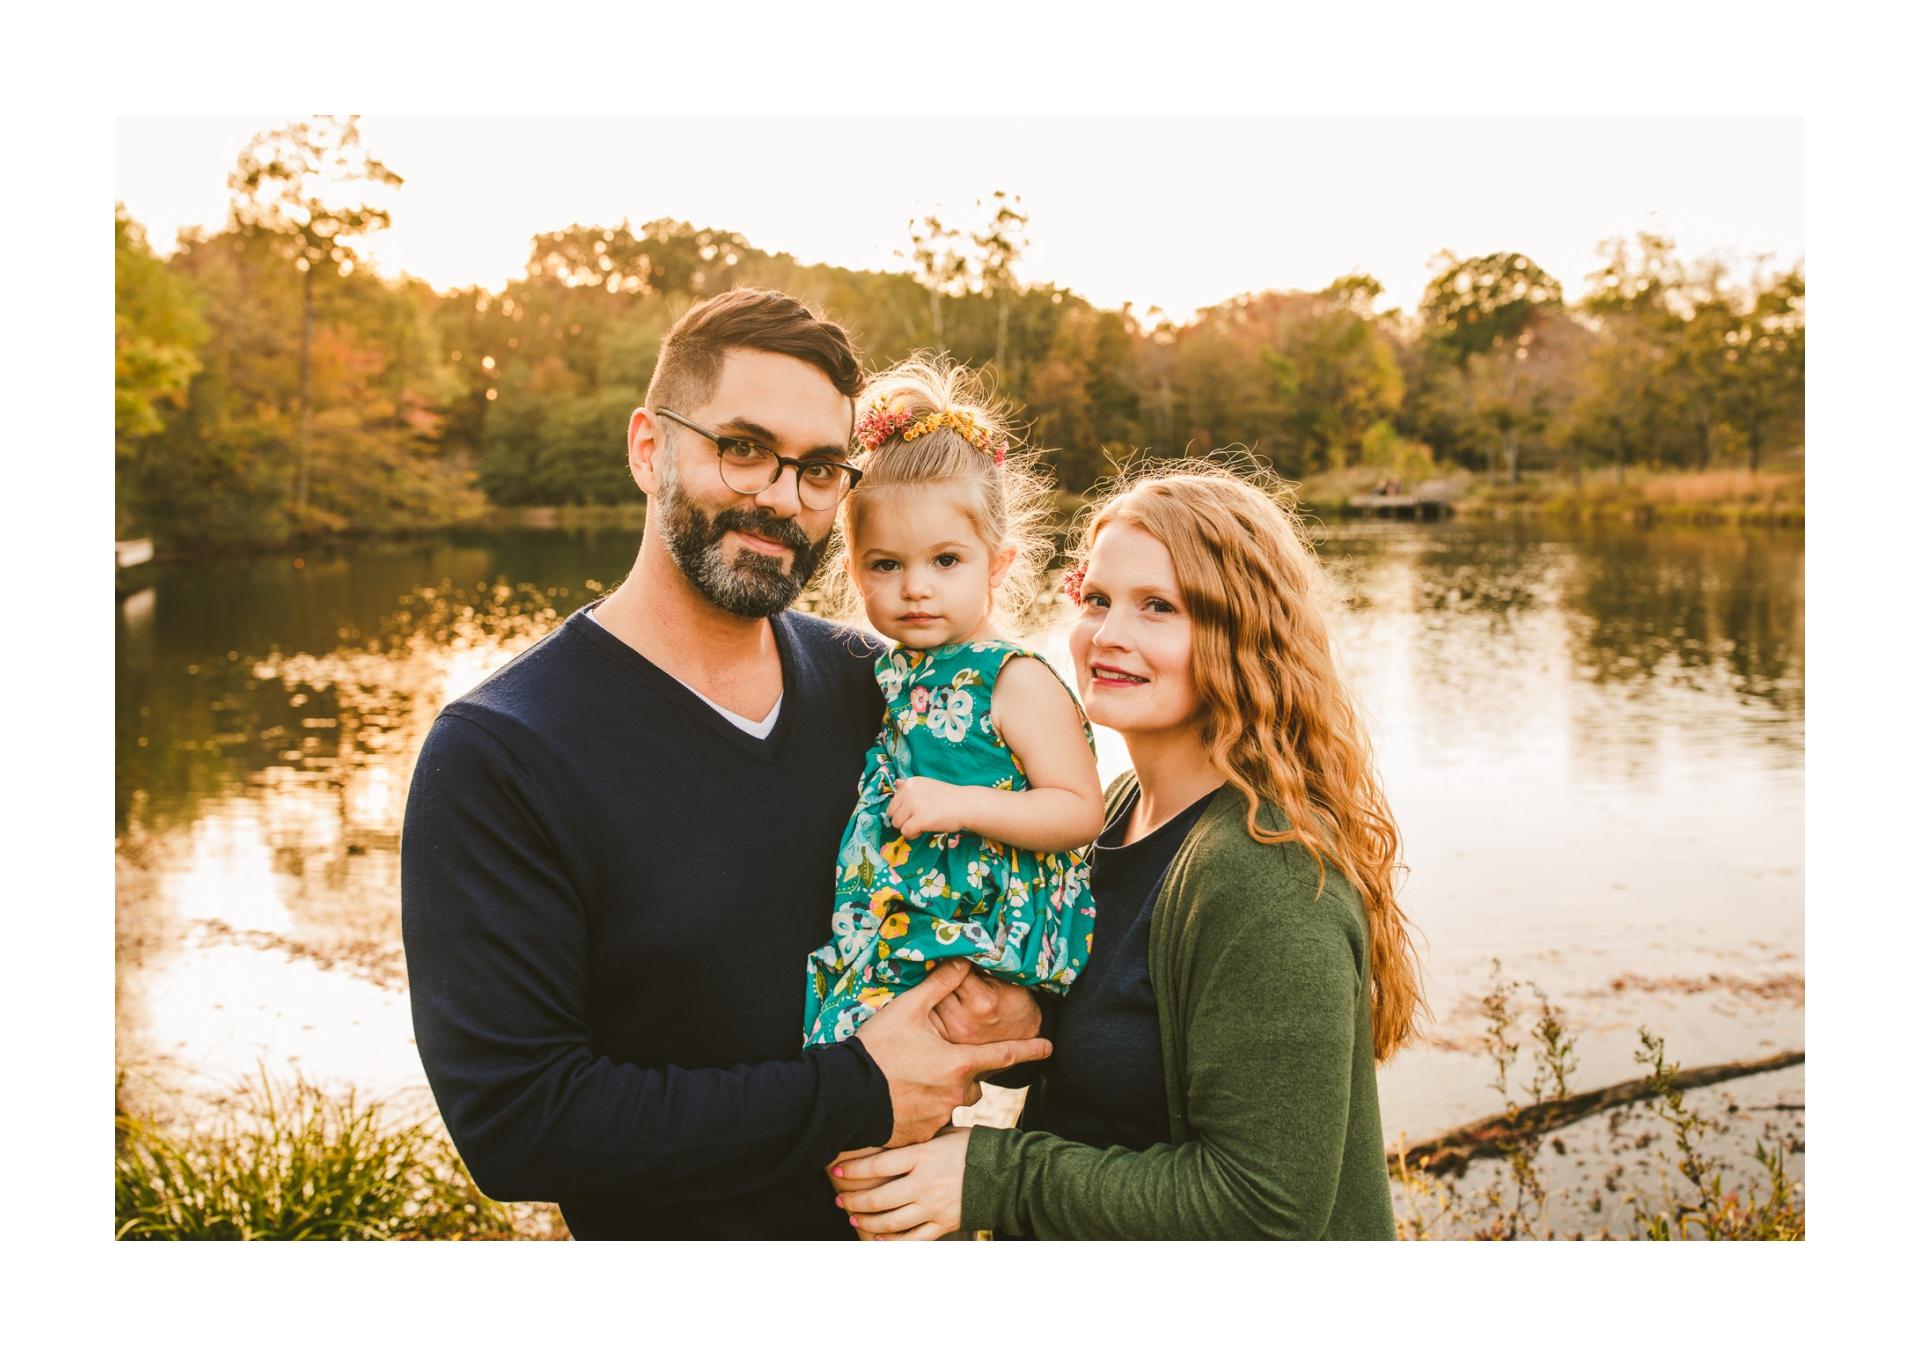 Lakewood Family Fall Portrait Photographer 18.jpg